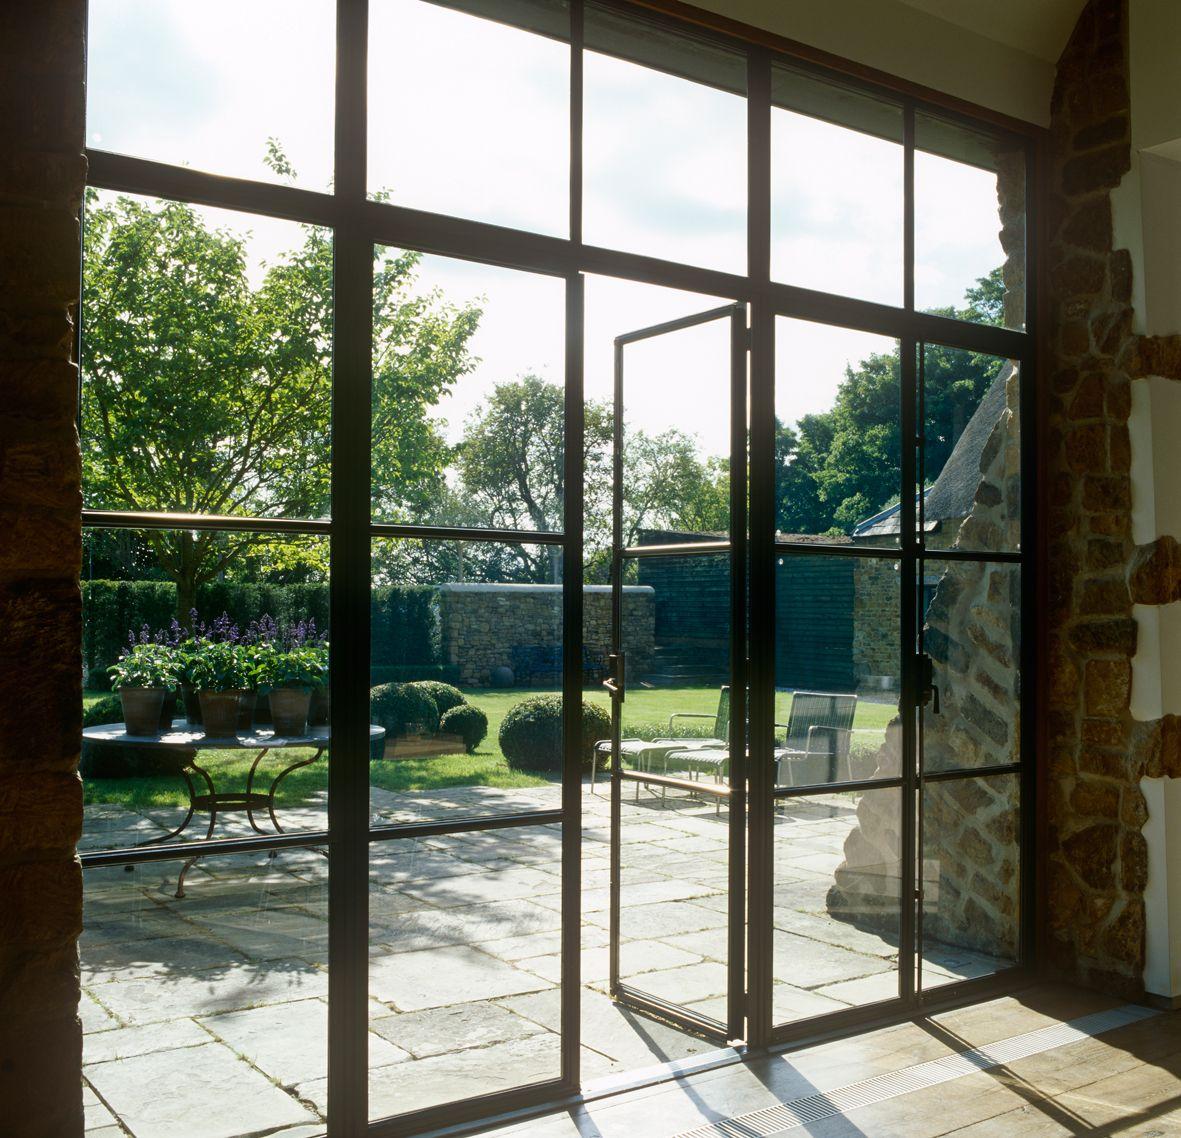 J O H N M I N S H A W D E S I G N S In 2020 Barn Windows Windows Windows And Doors